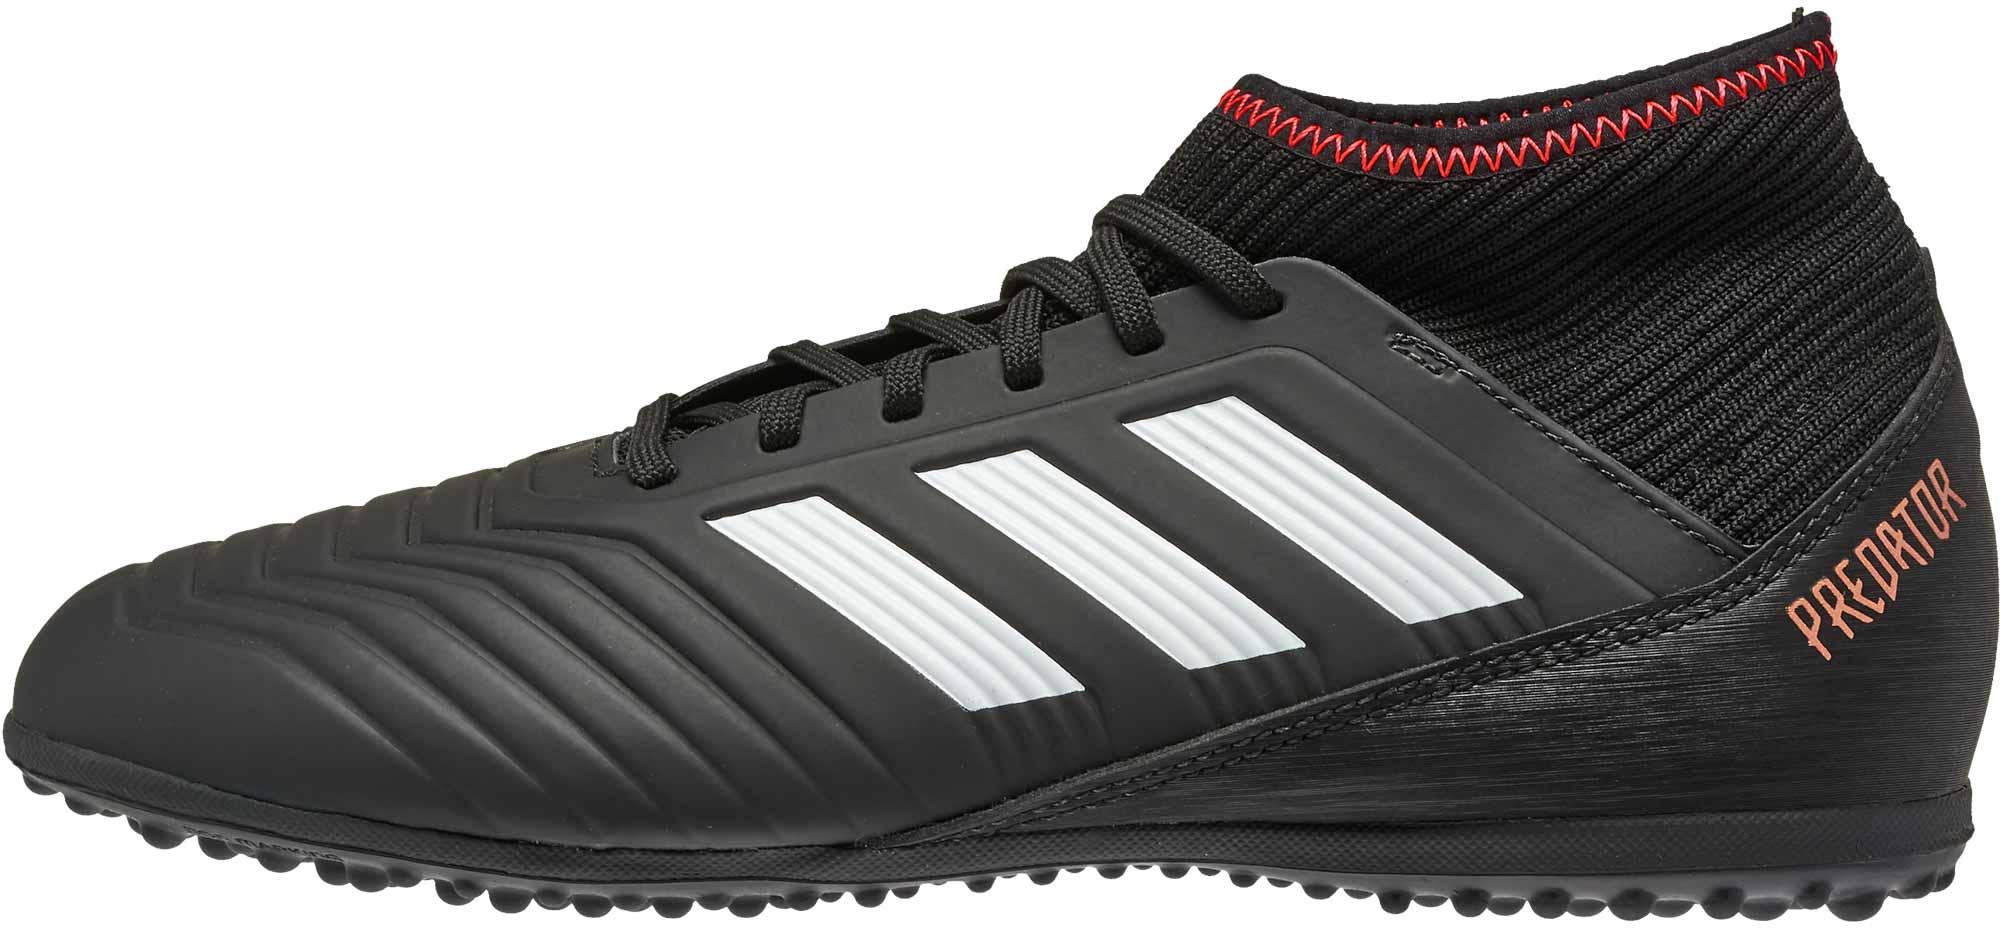 promo code eaa43 6e1e8 adidas Kids Predator Tango 18.3 TF – Black Solar Red